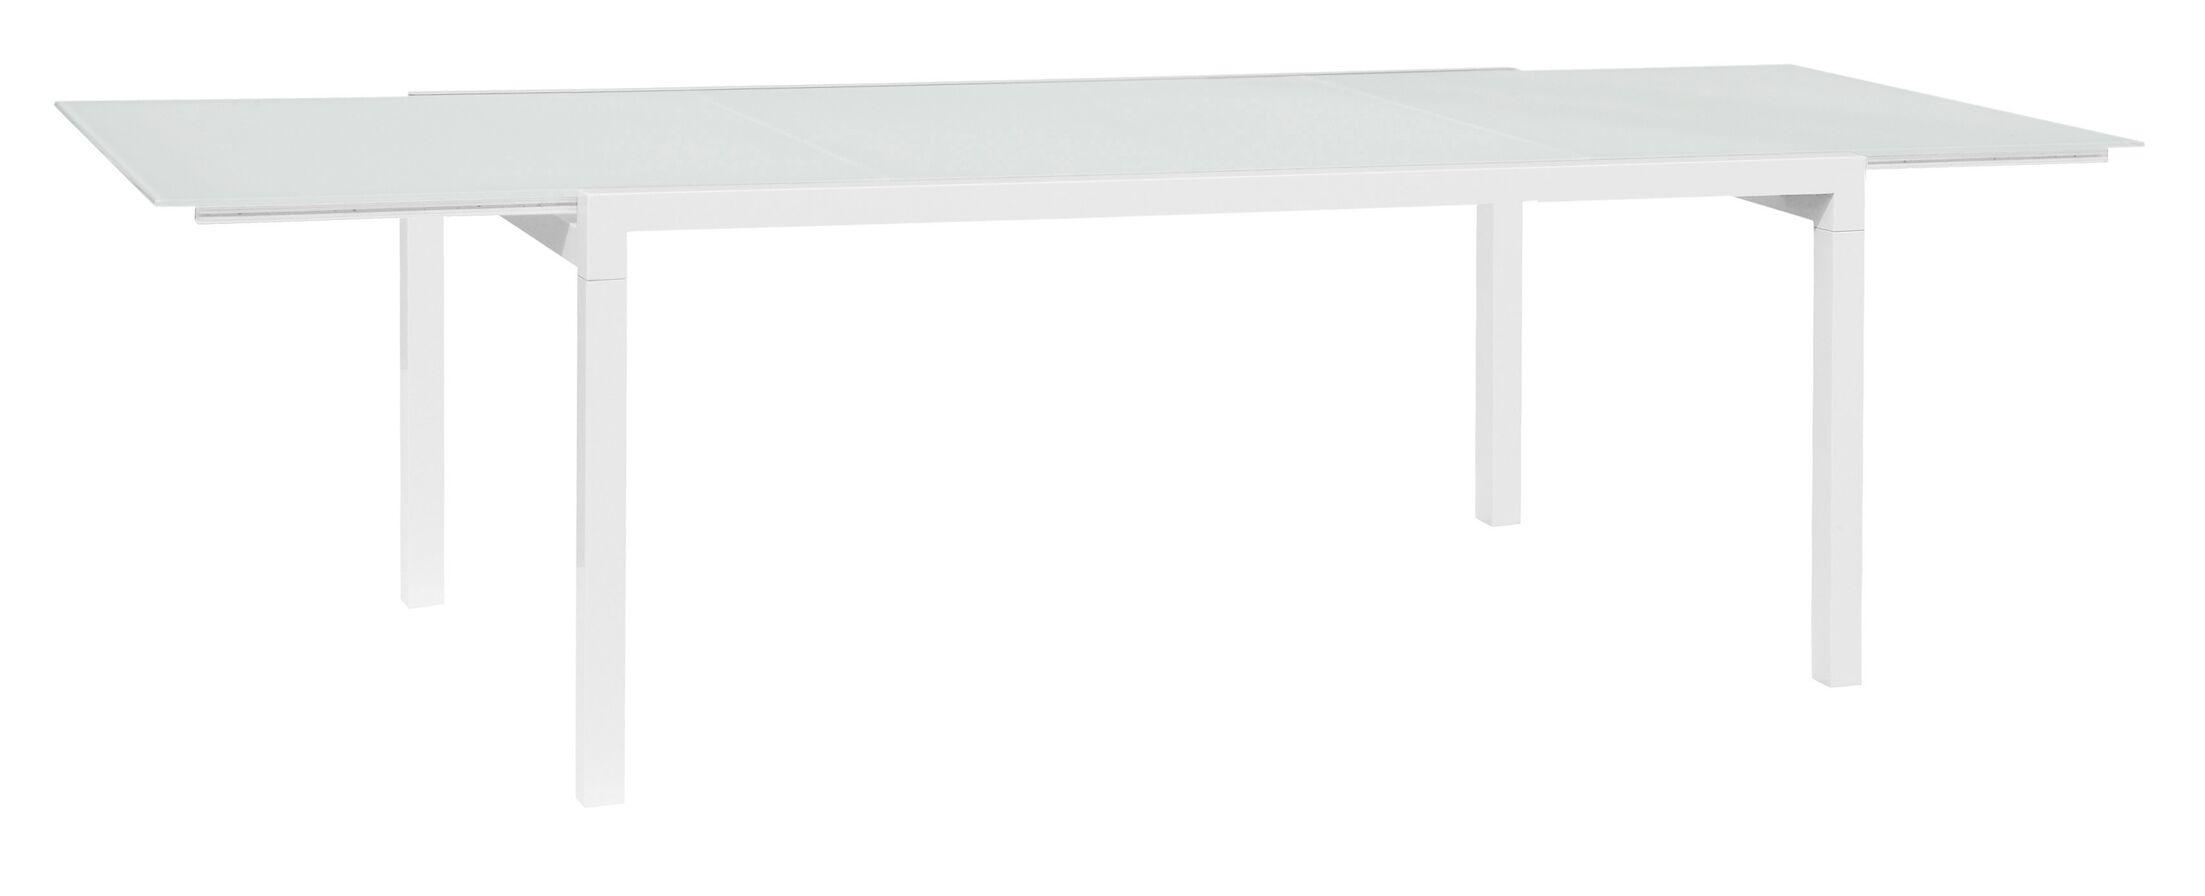 Santistevan Dining Table Table Size: 70.9